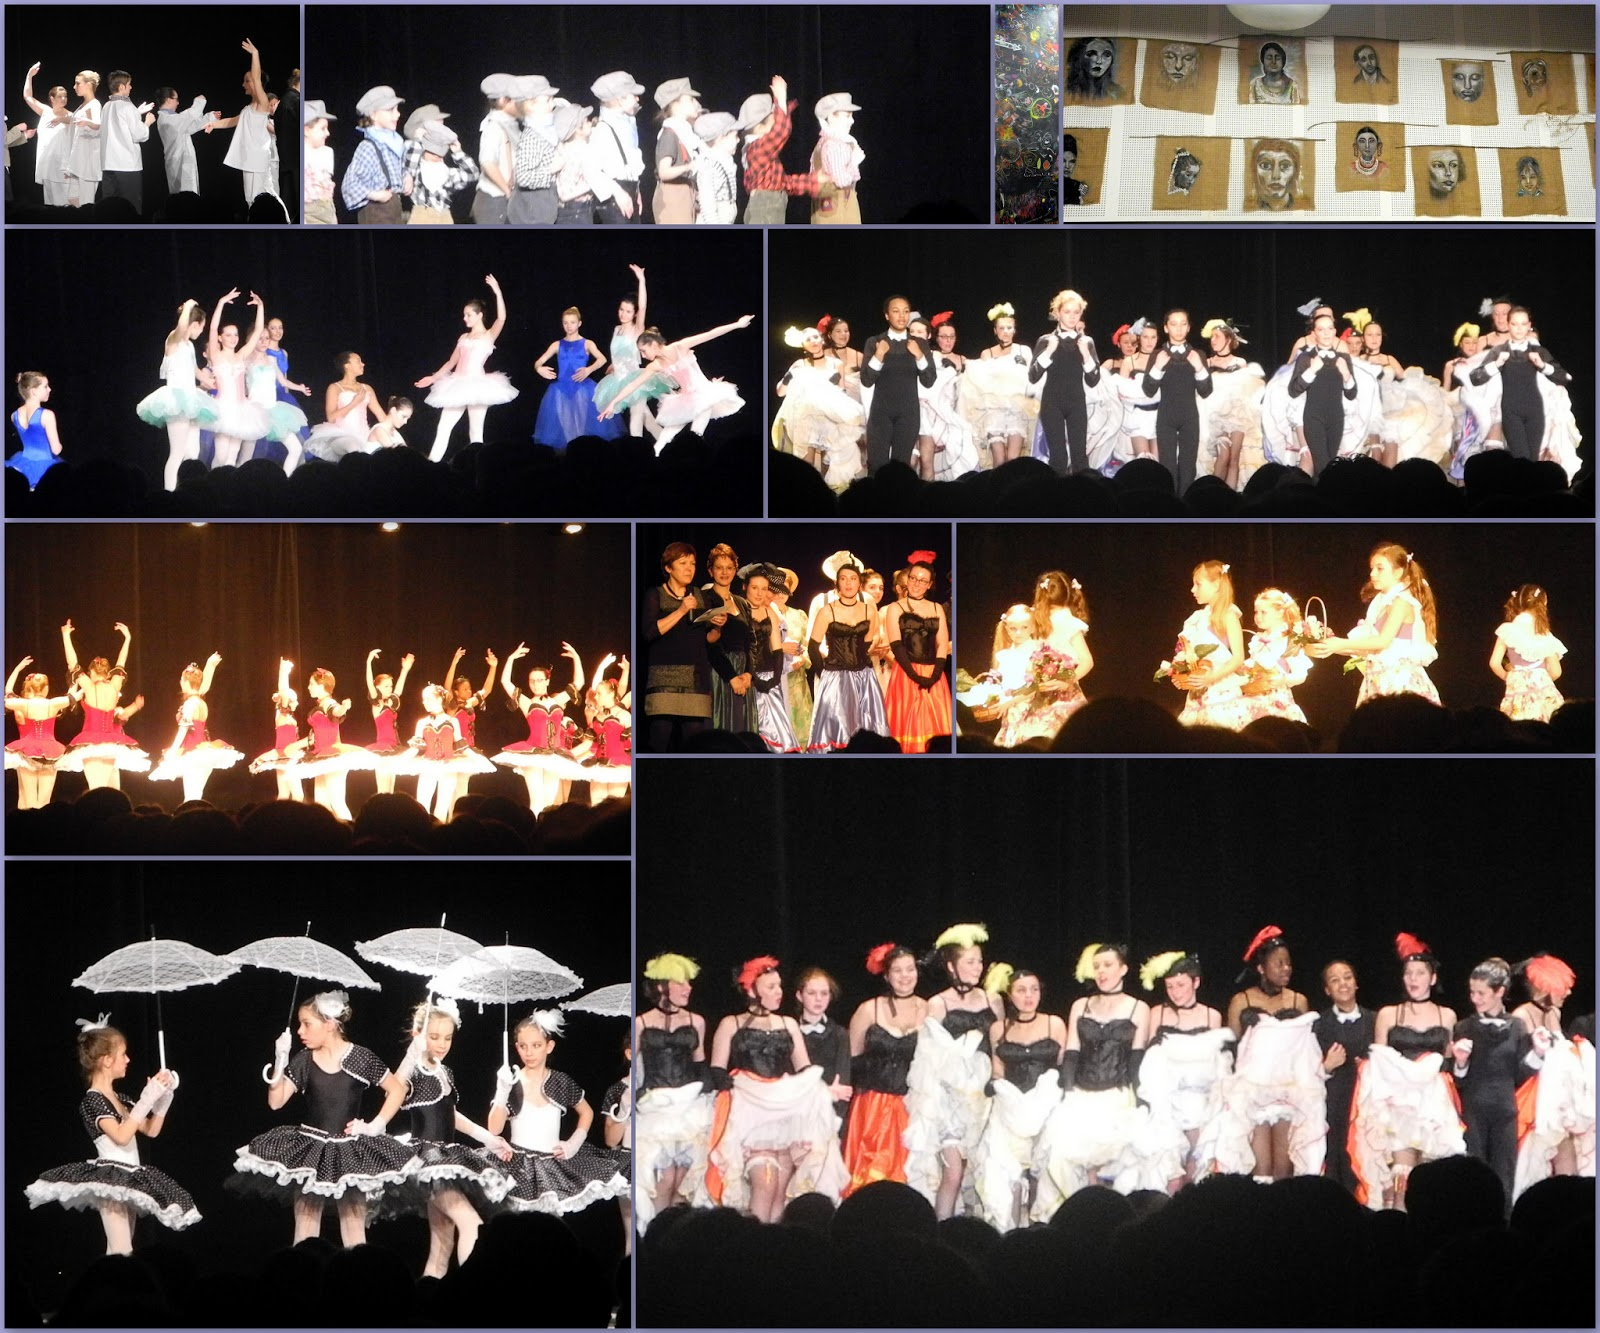 ecole de danse classique de geispolsheim